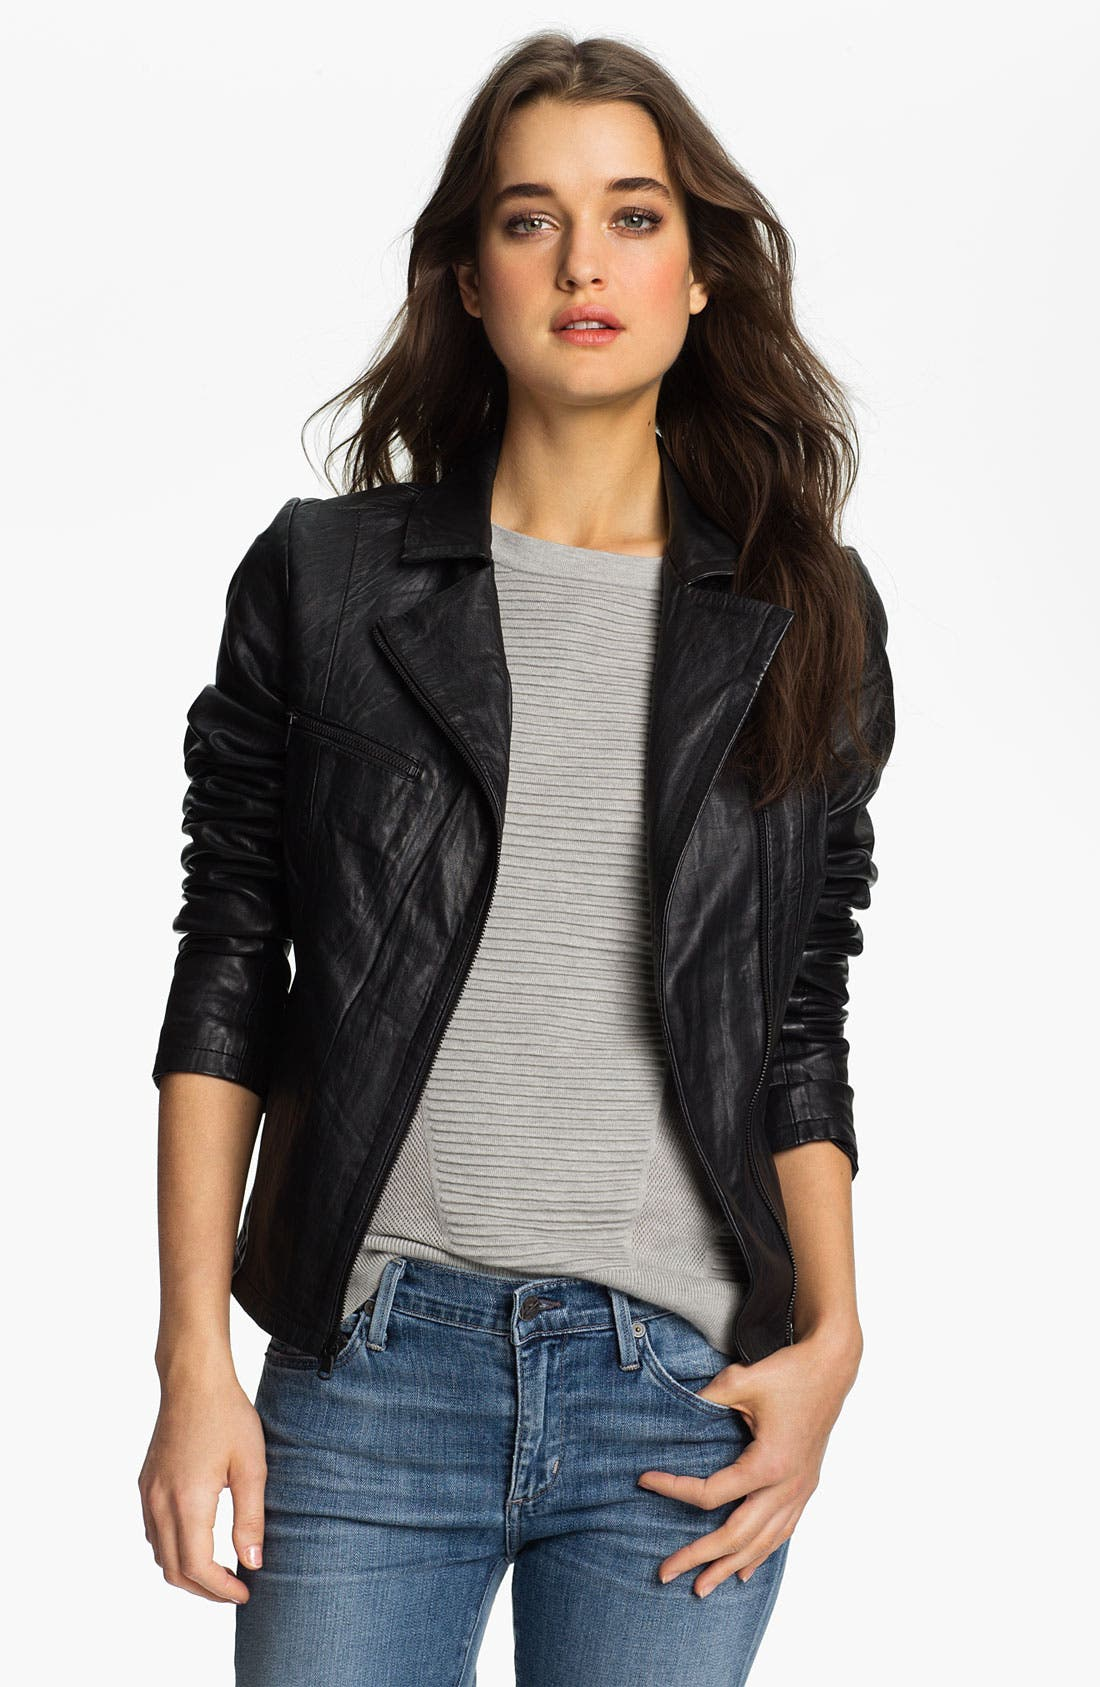 Main Image - Paige Denim 'Ridley' Leather Biker Jacket